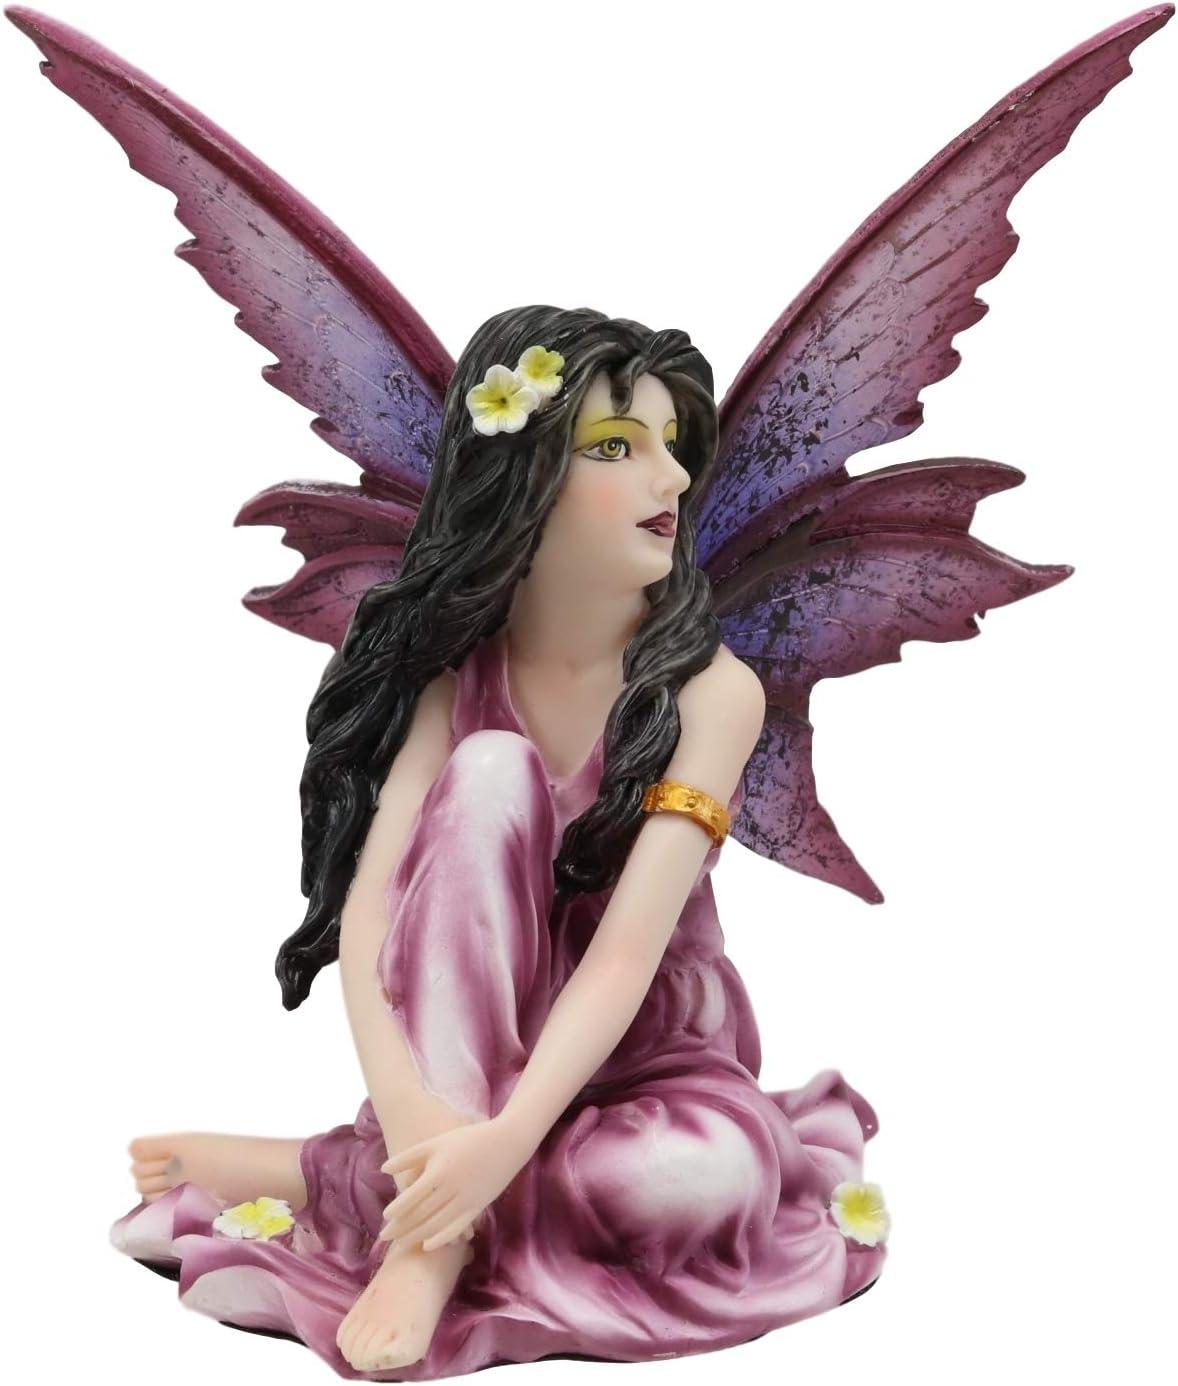 Purple Fairy 11x17 Original Art Print  Beautiful Anime Woman Fairy Digital Illustration Magic Purple Lovely Magical Fantasy Fairy Wings